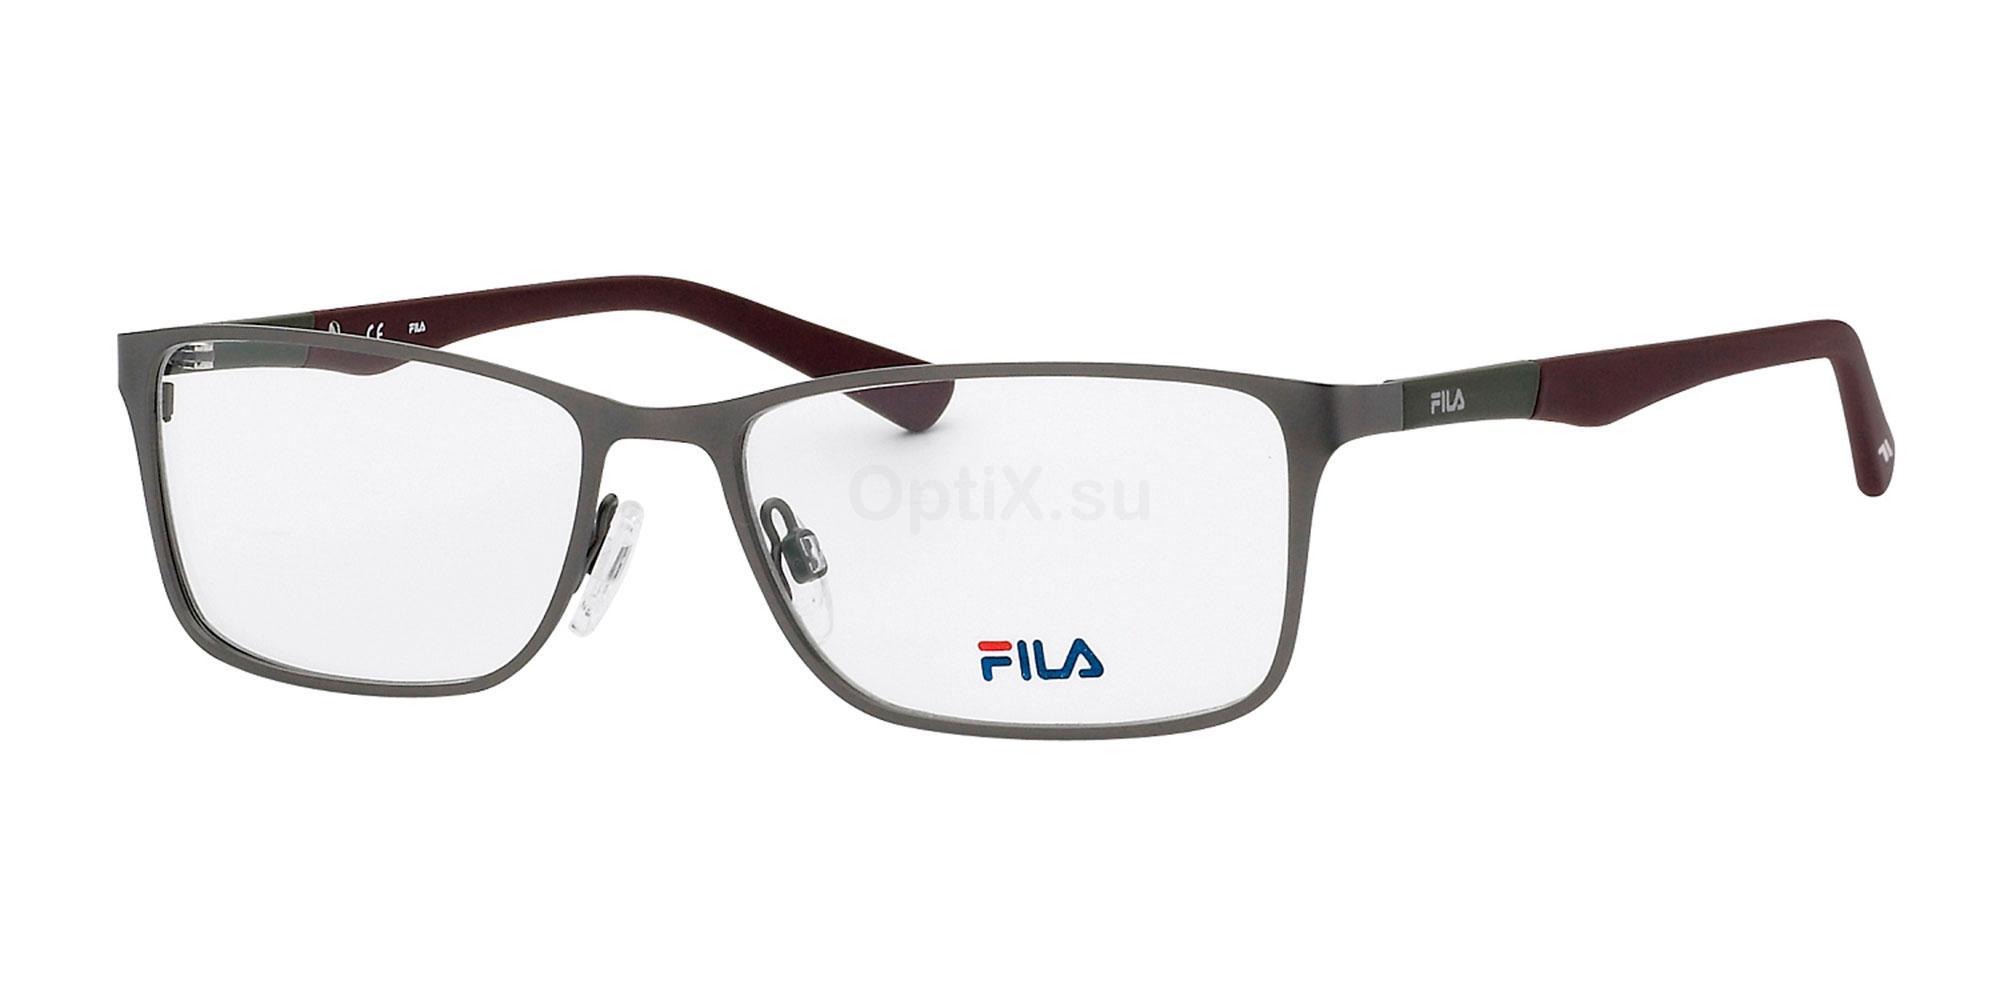 0627 VF9733 Glasses, Fila